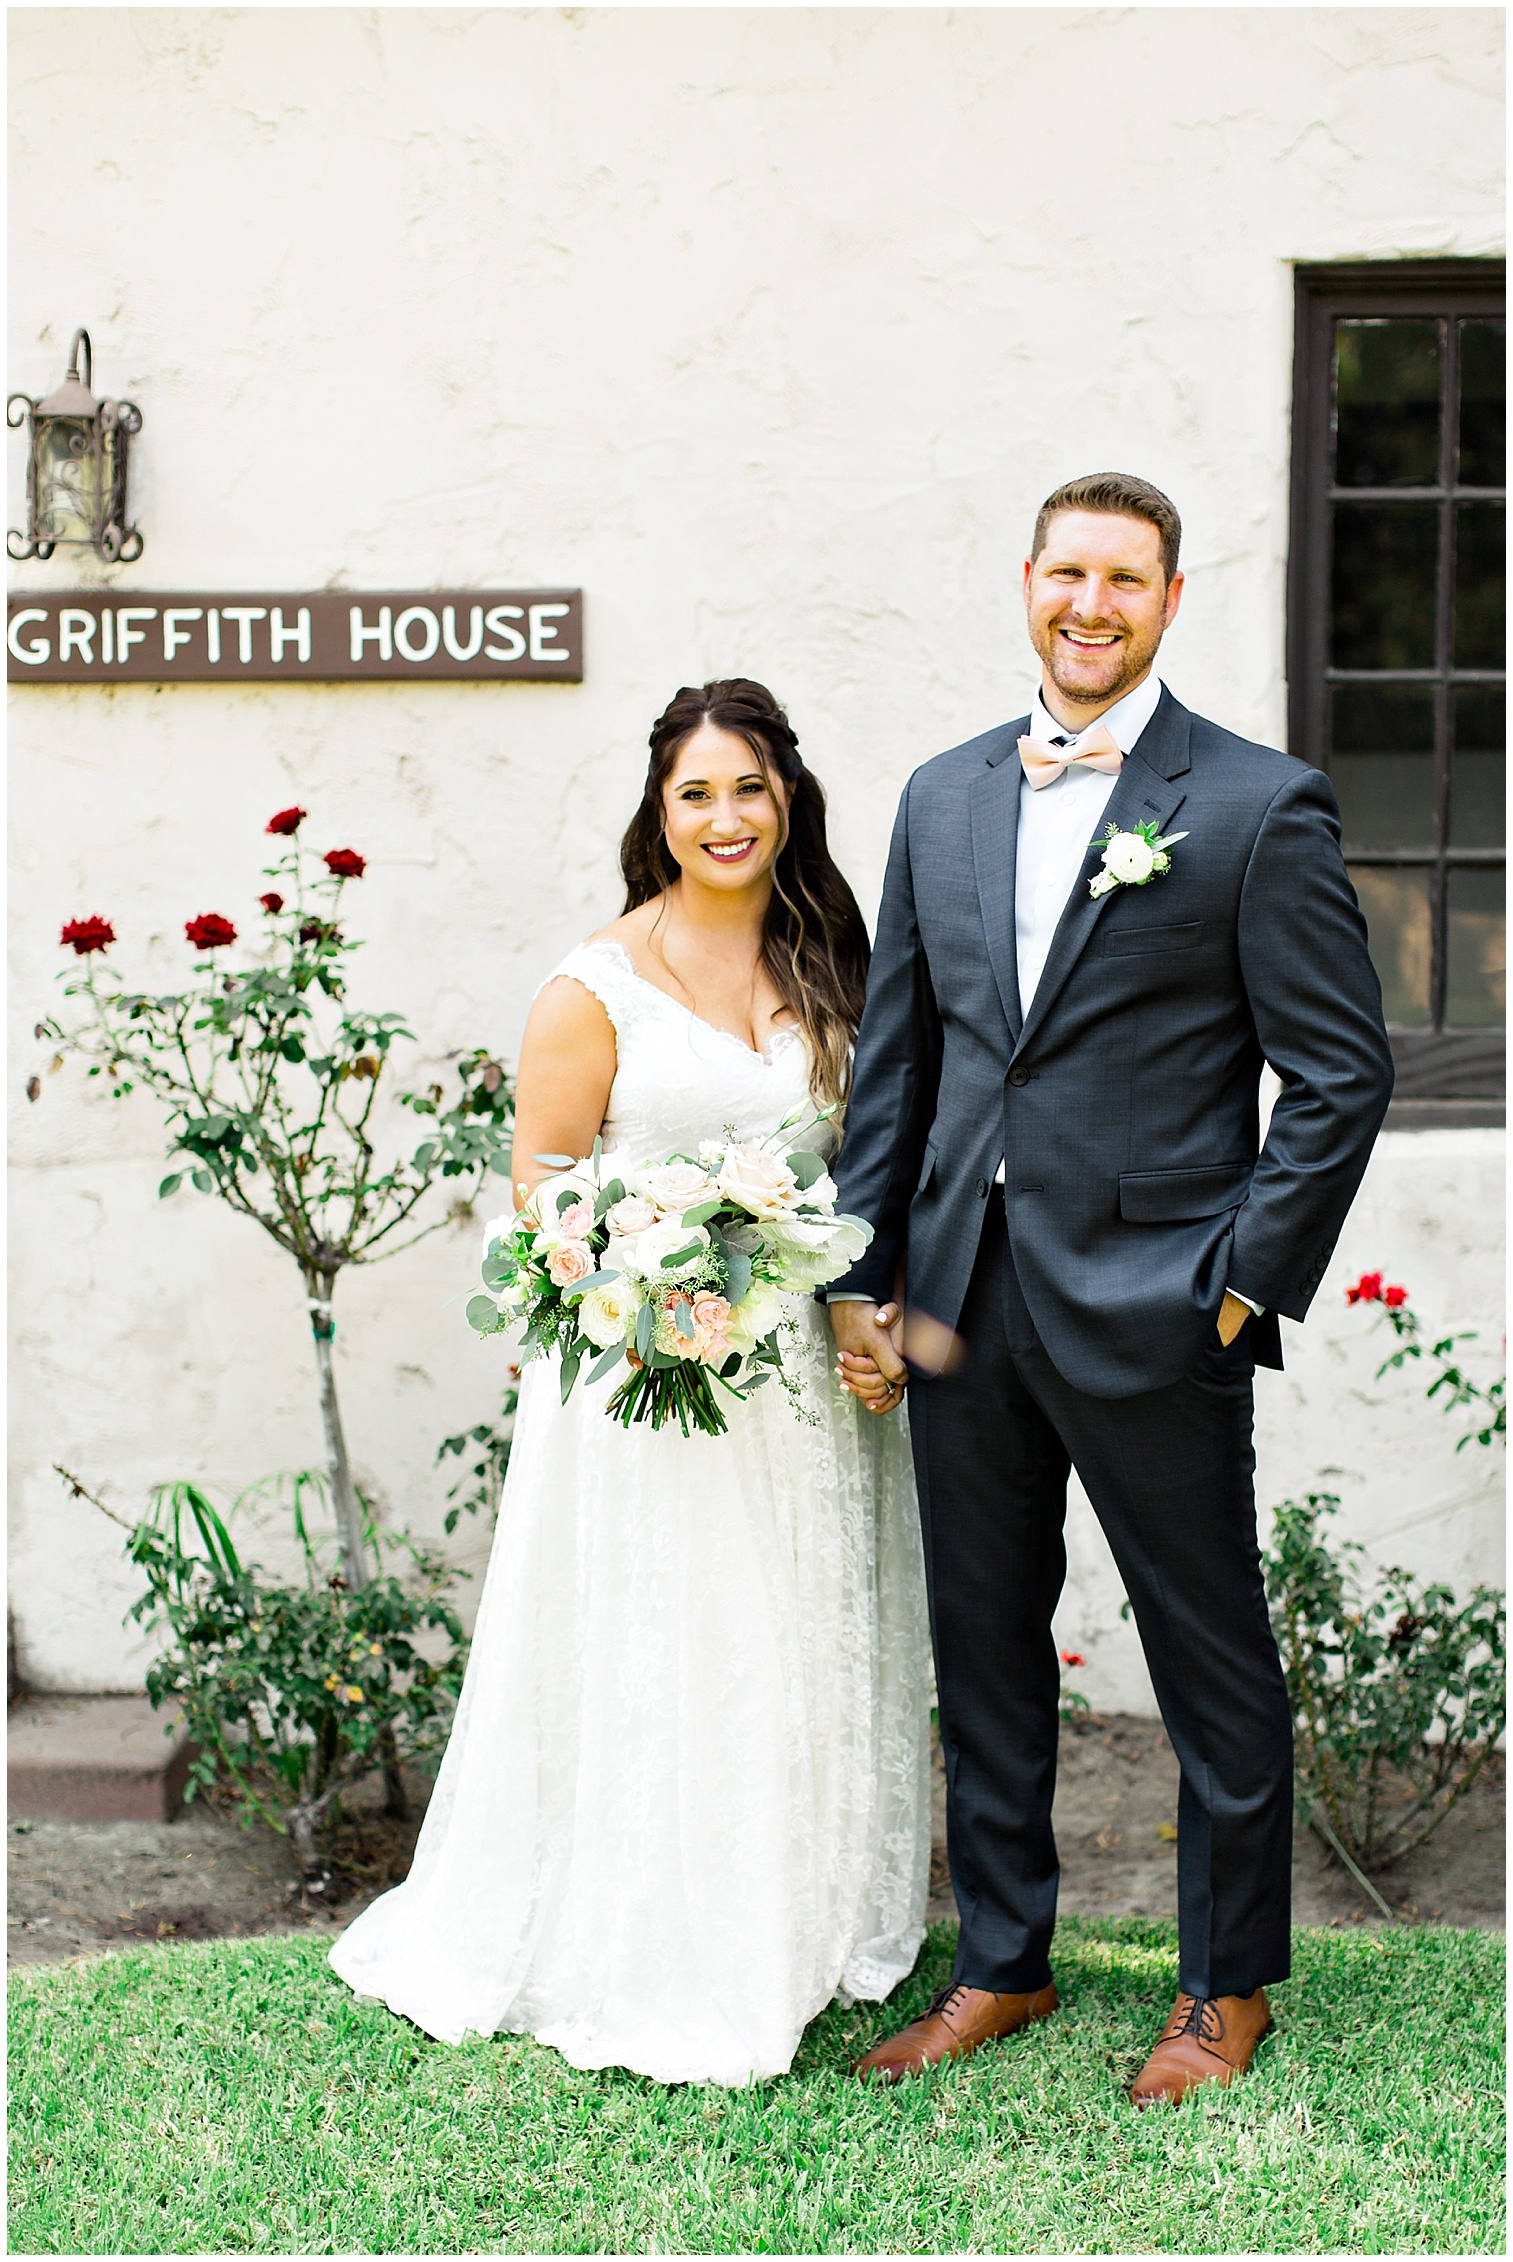 Griffith_House_Wedding_Photography_0553.jpg